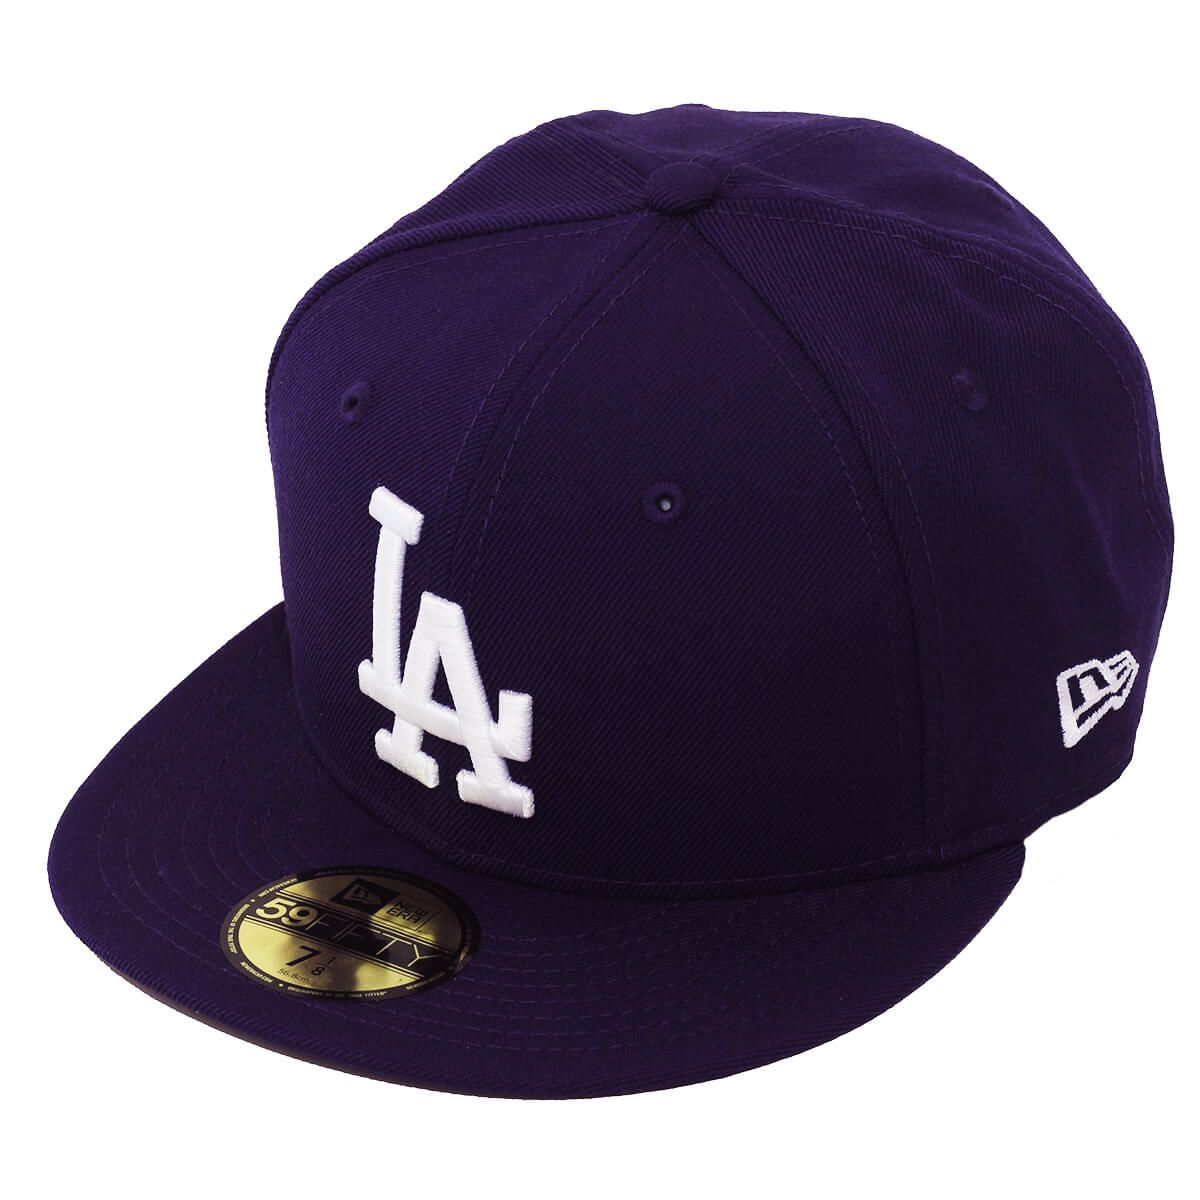 Boné New Era Aba Reta 5950 MLB Los Angeles Basic Colors Roxo